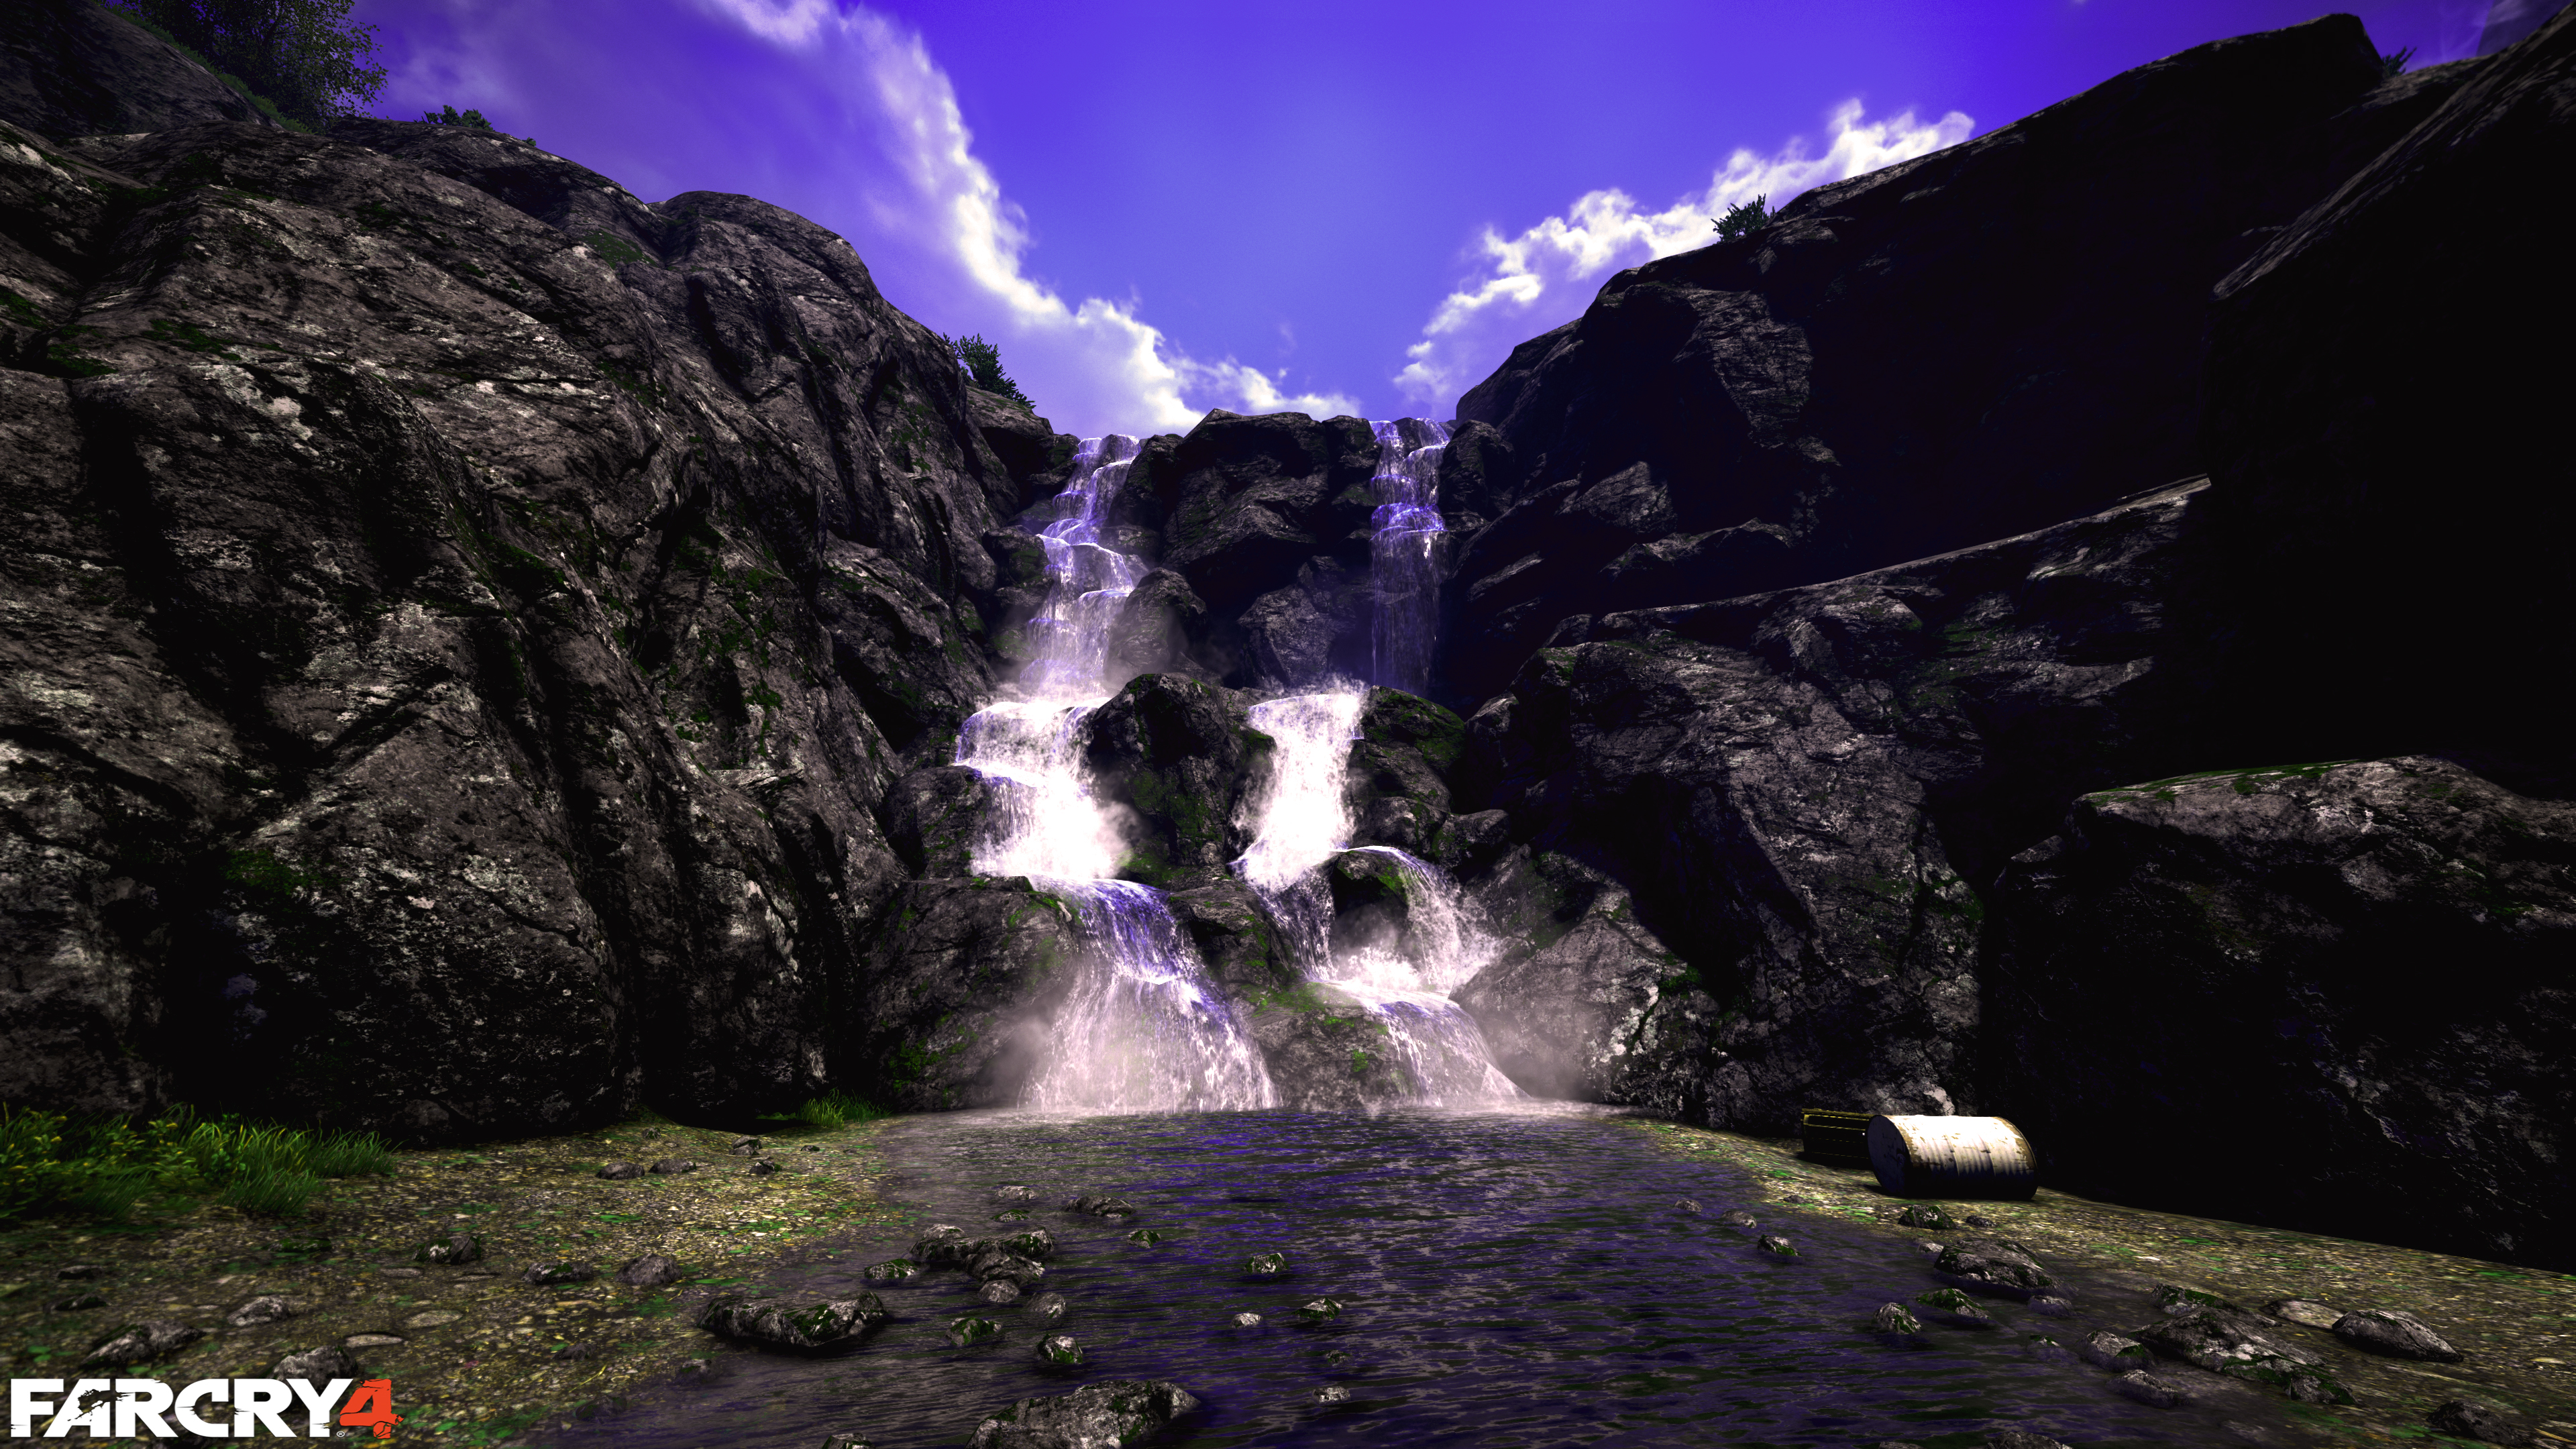 Free Download Far Cry 4 Waterfall 4k Computer Wallpapers Desktop